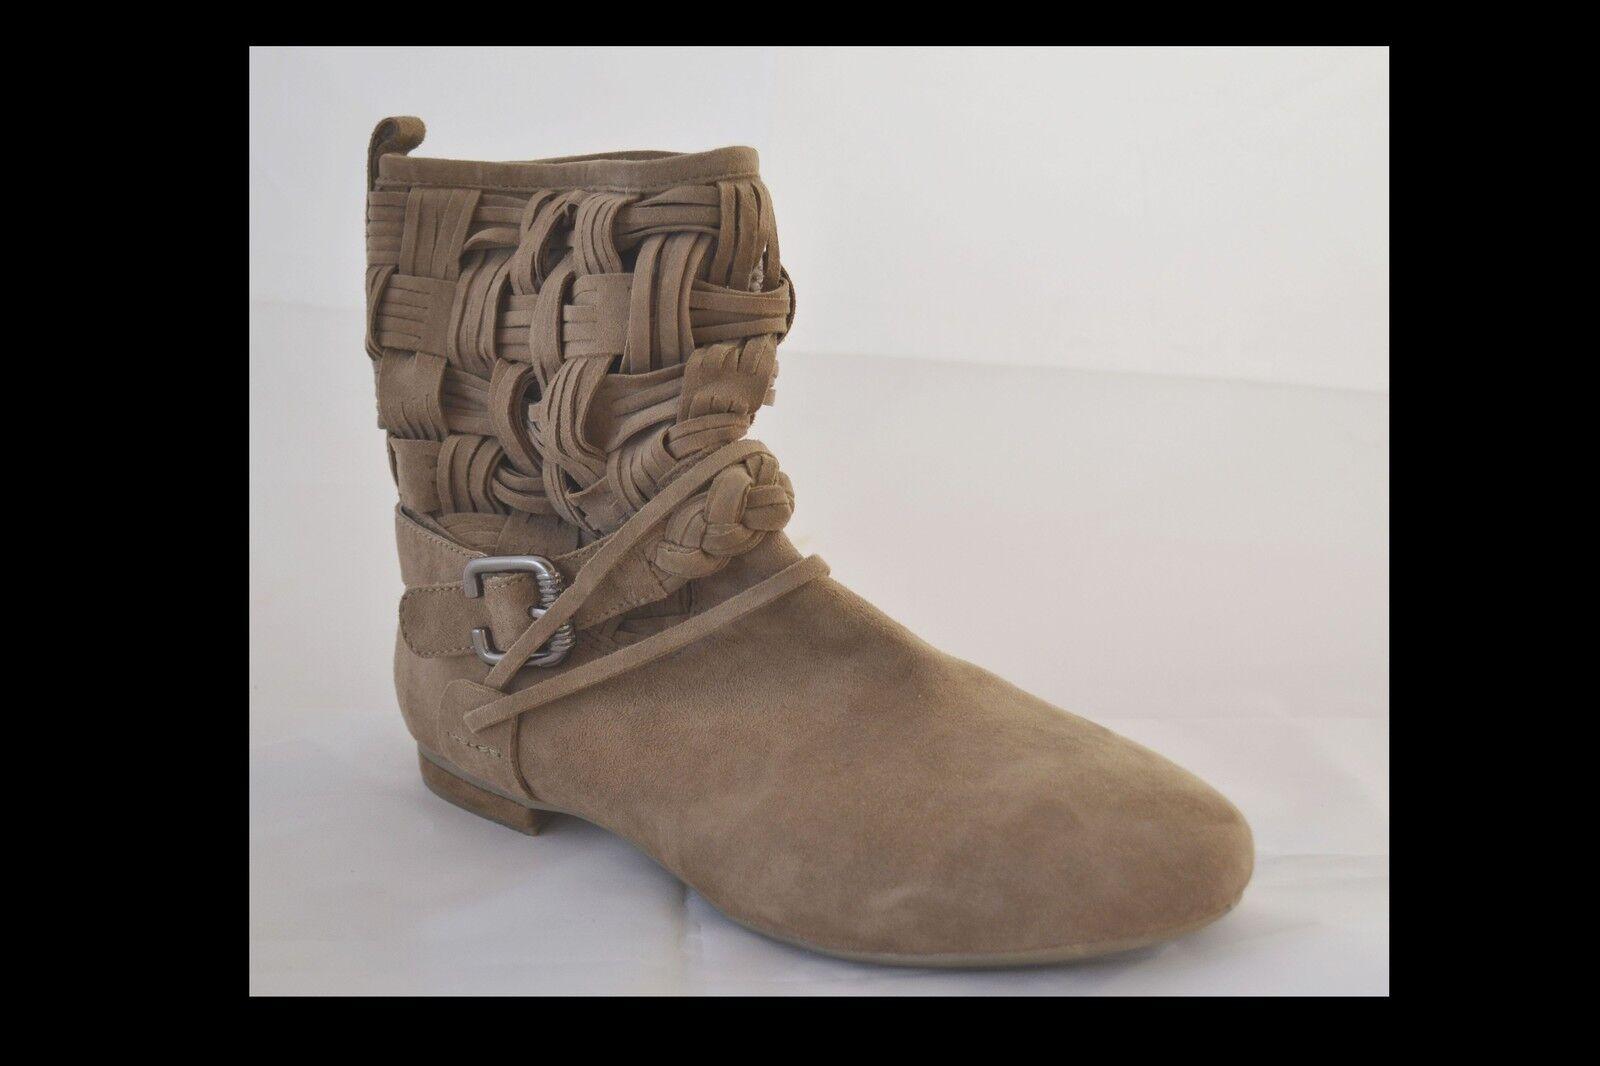 Zapatos Mujer Botas De Mujer Zapatos Dulce Con Moño Cremallera Lateral Tacón Aguja Fiesta Informal Puntera Puntiaguda f78472